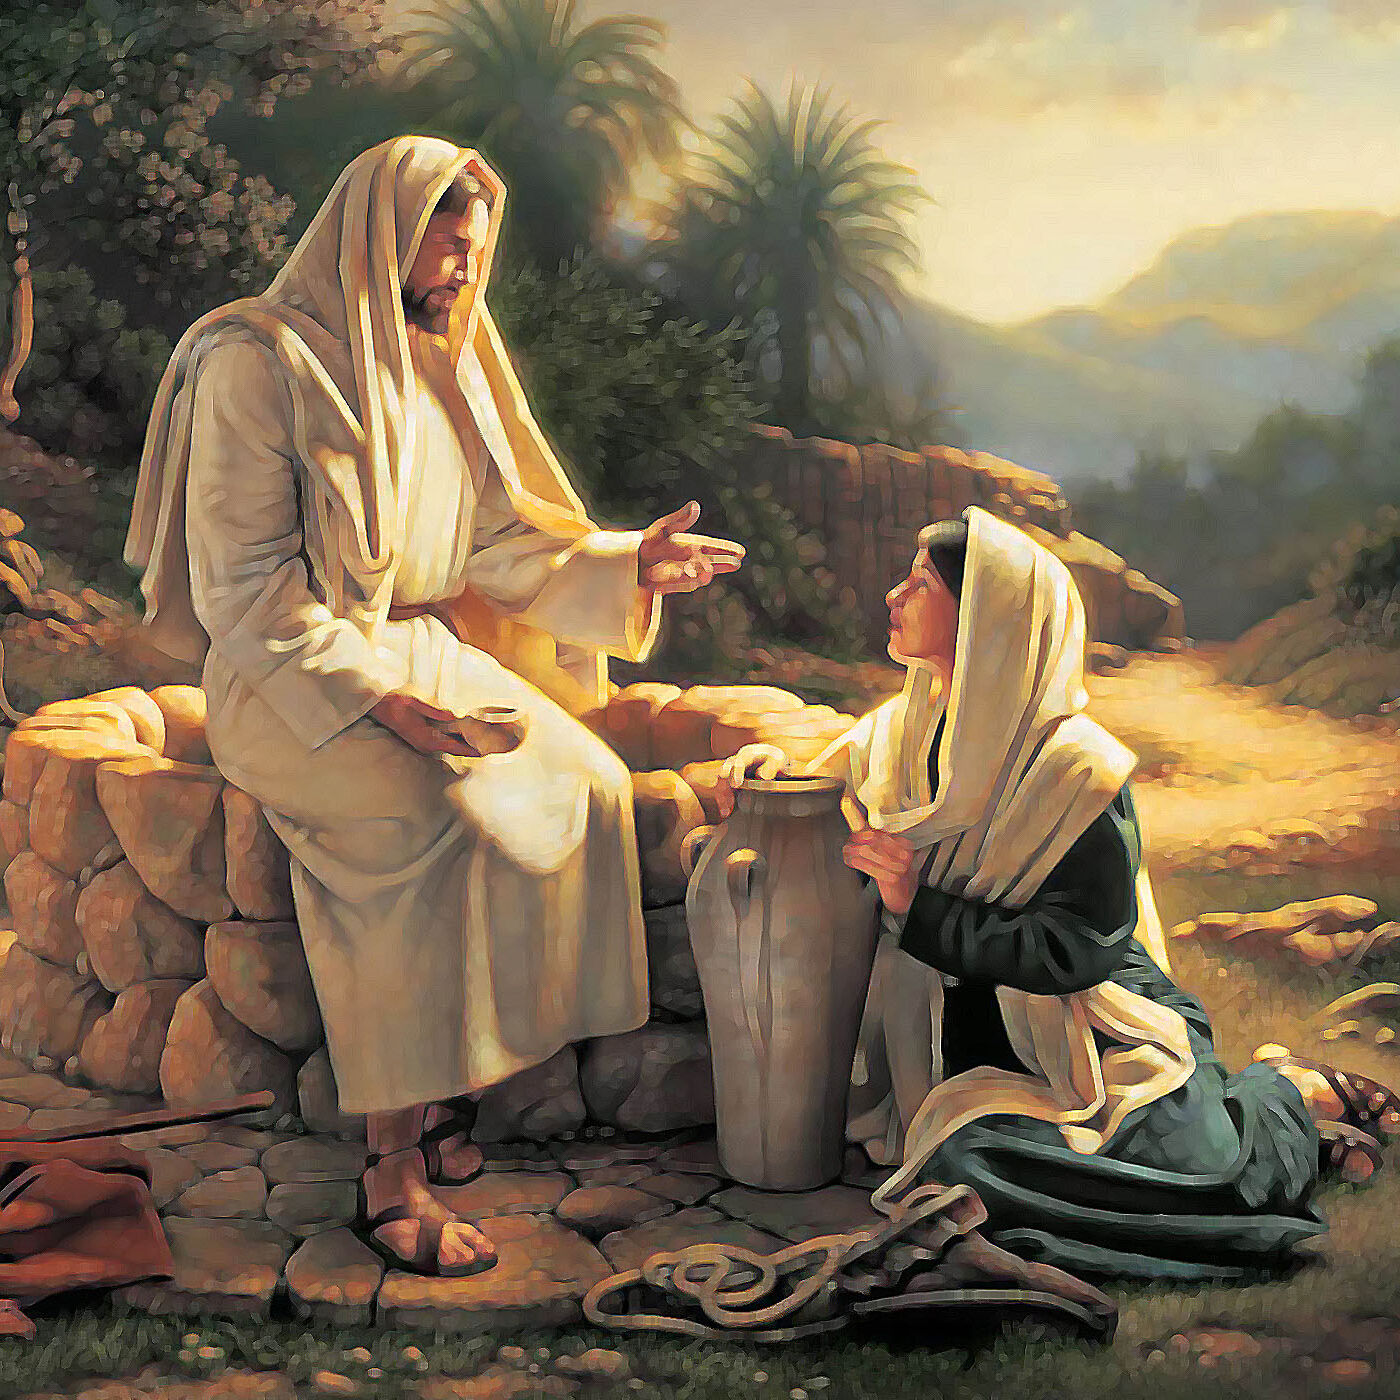 riflessioni sul Vangelo di Venerdì 8 Gennaio 2021 (Mc 6, 34-44) - Apostola Simona